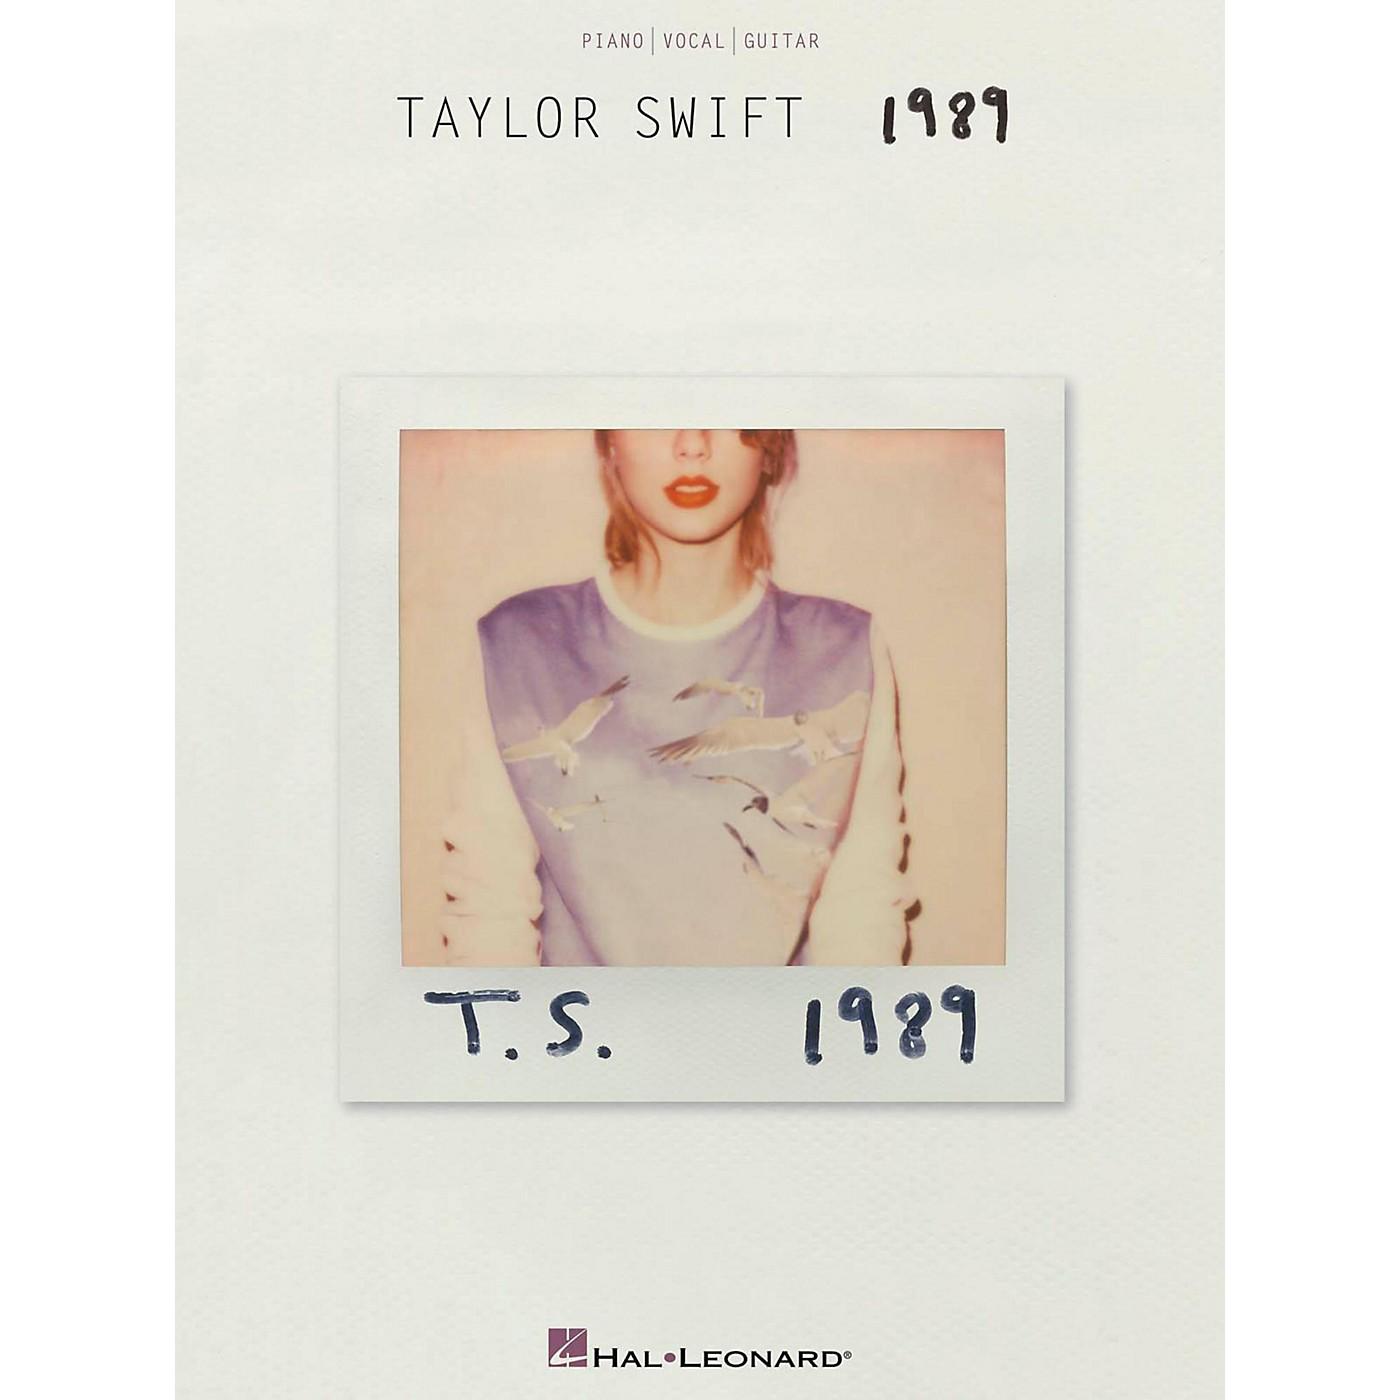 Hal Leonard Taylor Swift - 1989 Piano/Vocal/Guitar thumbnail